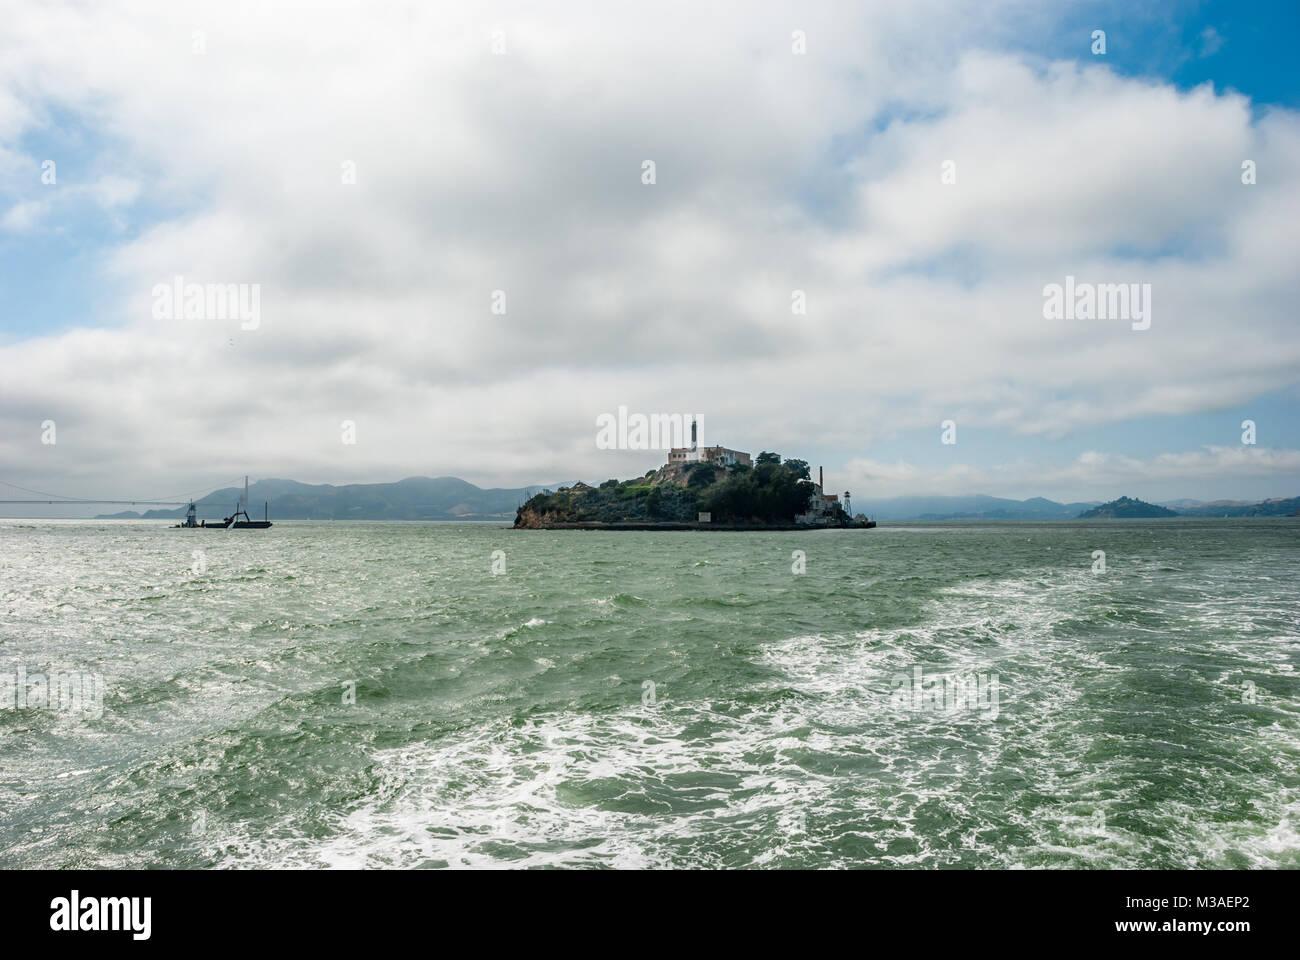 Alcatraz Island, Alcatraz Views, The Rock, San Francisco Bay, Green Water and Clouds, Boat Tour, California - Stock Image